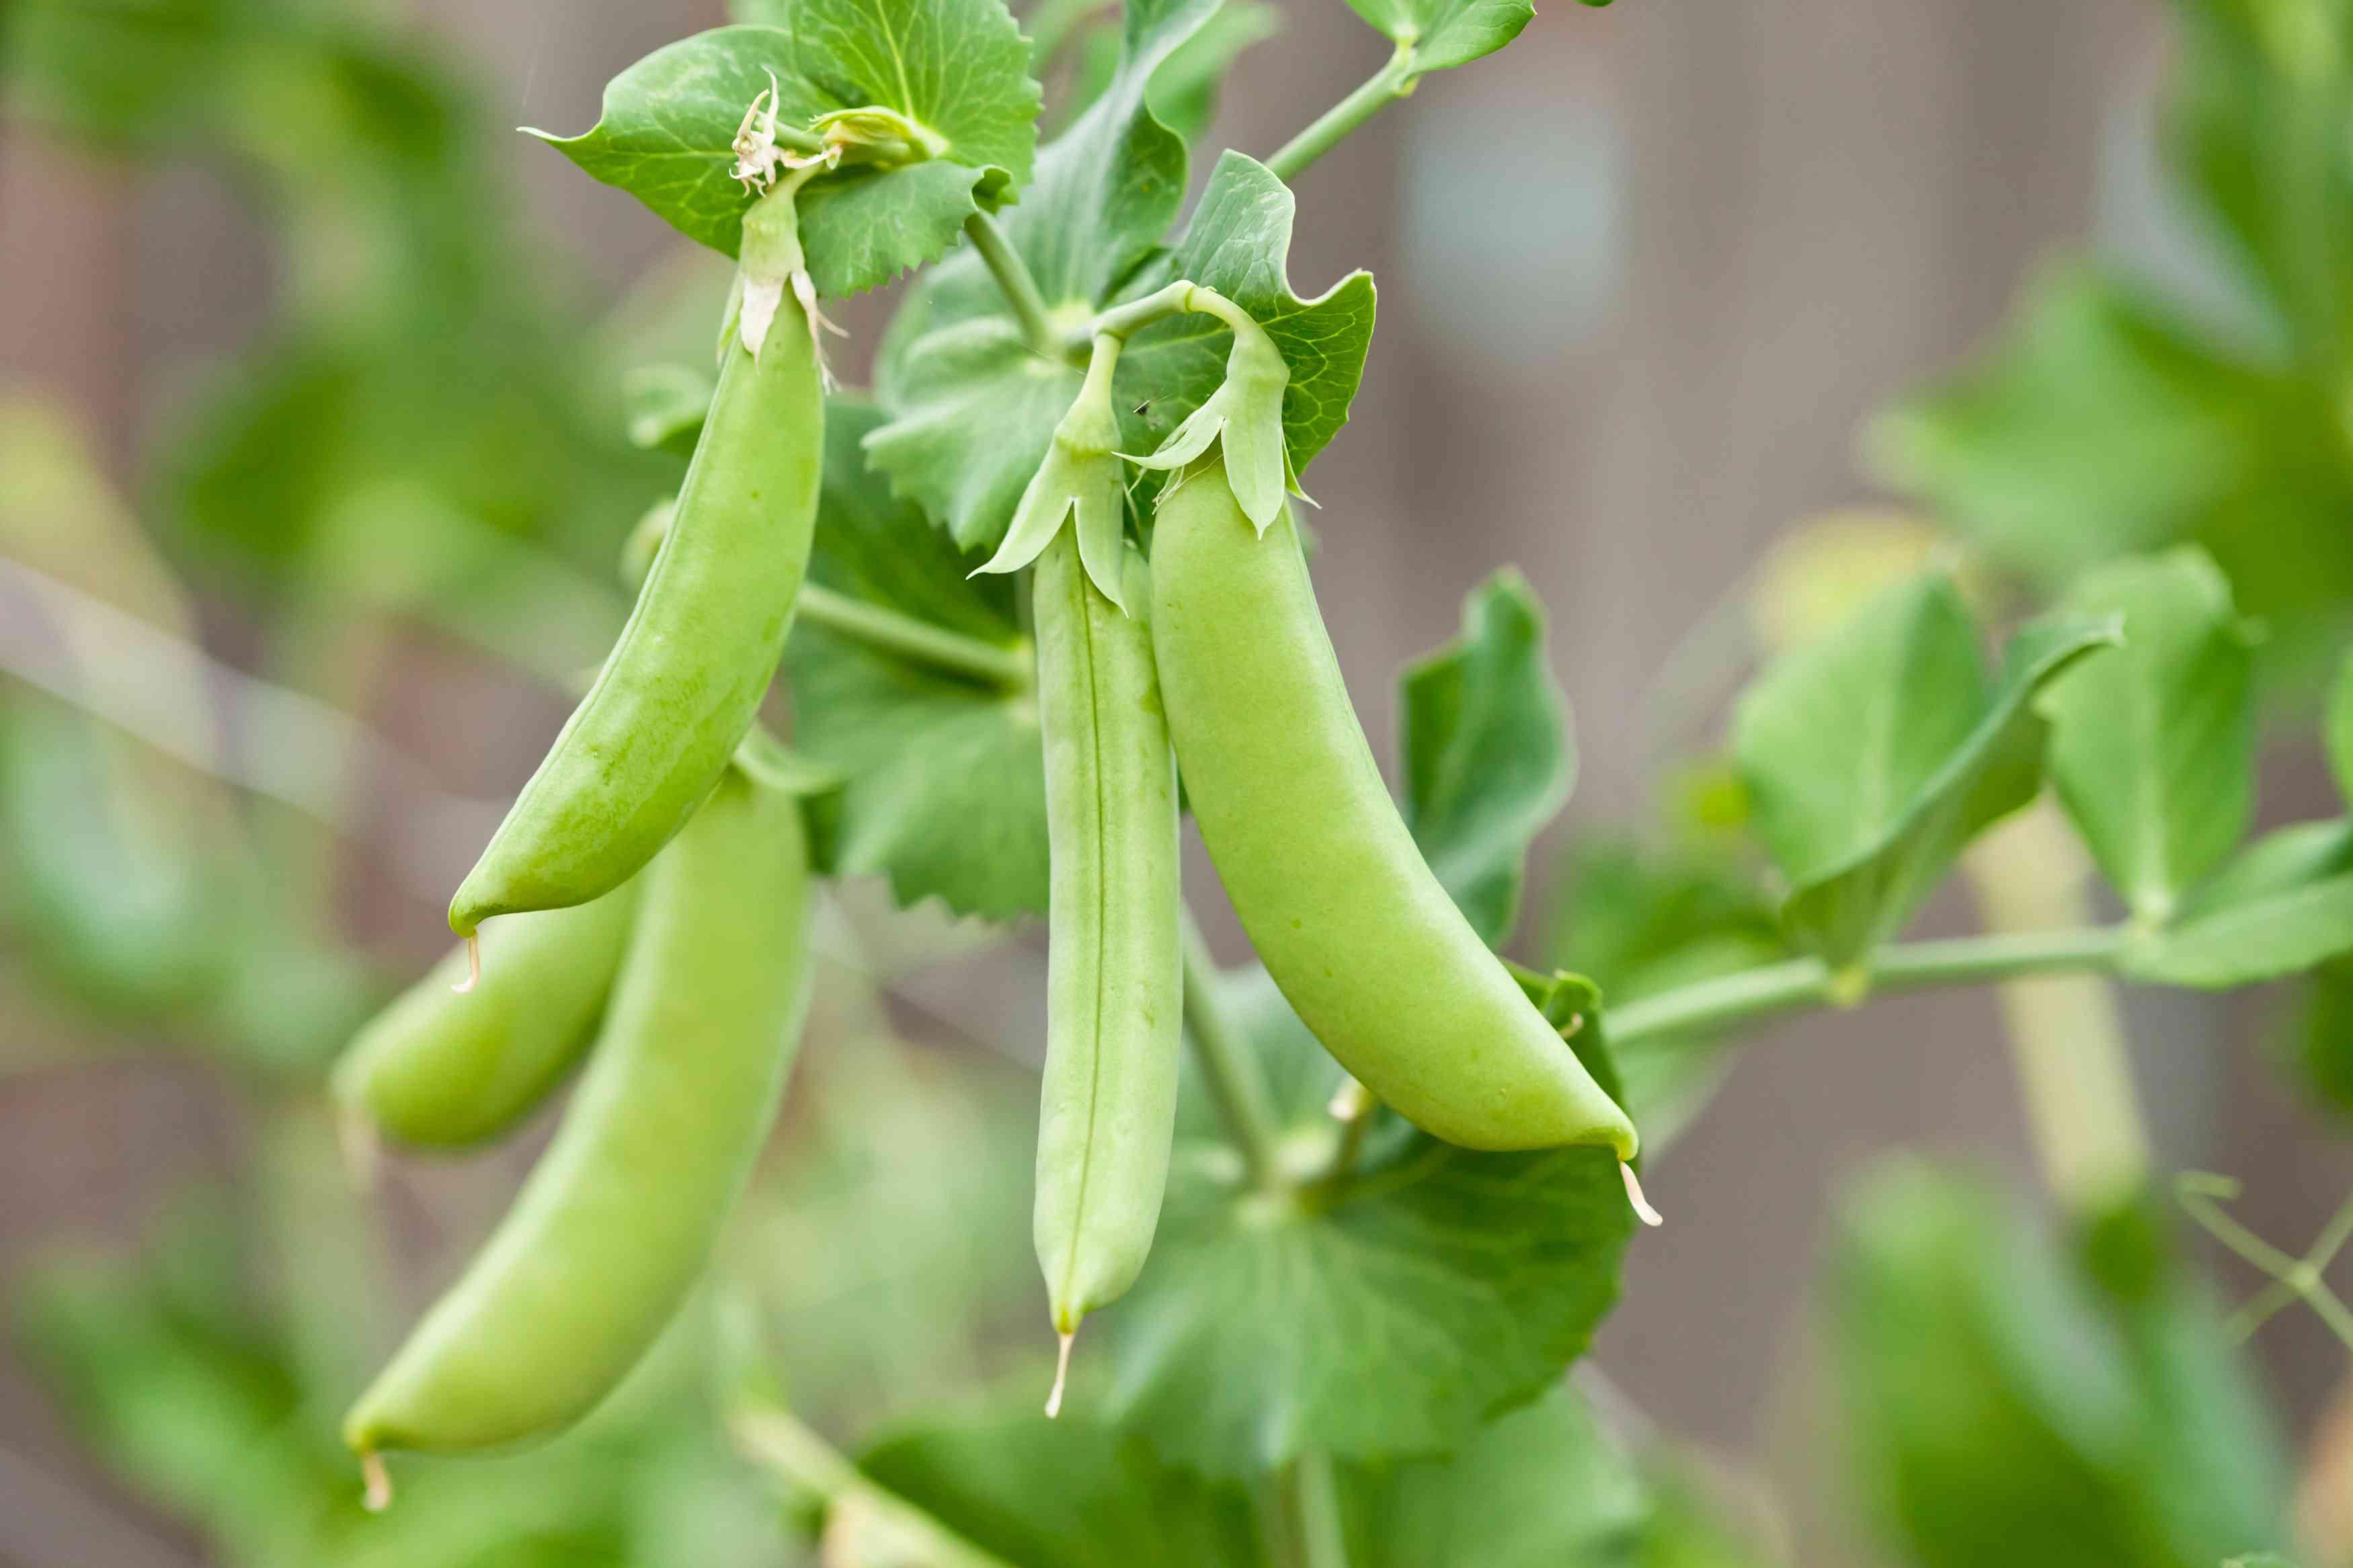 Several bright green sugar snap peas hang on a vine